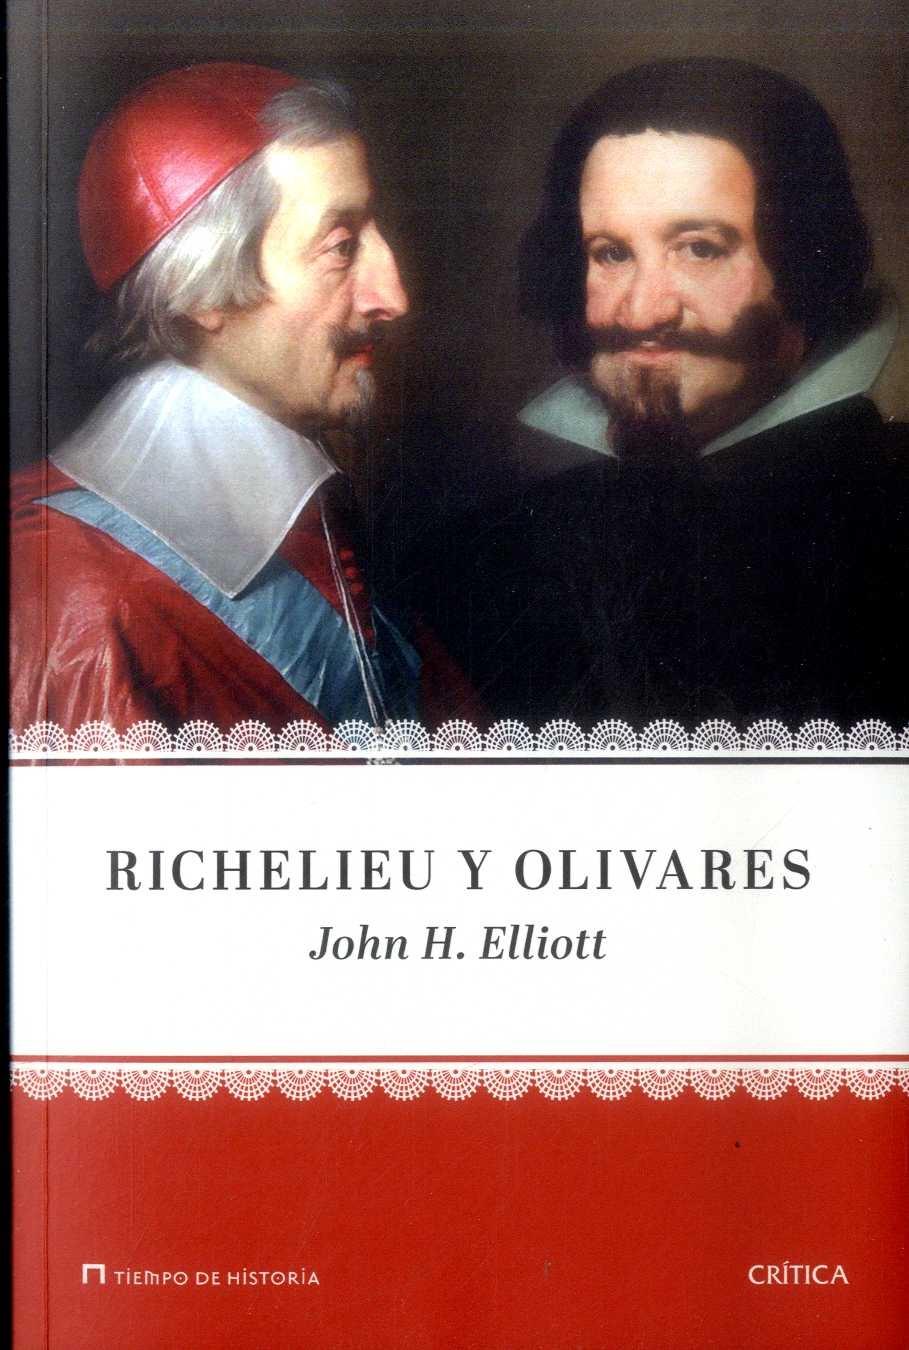 Richelieu y Olivares - J. H. Elliott - Crítica